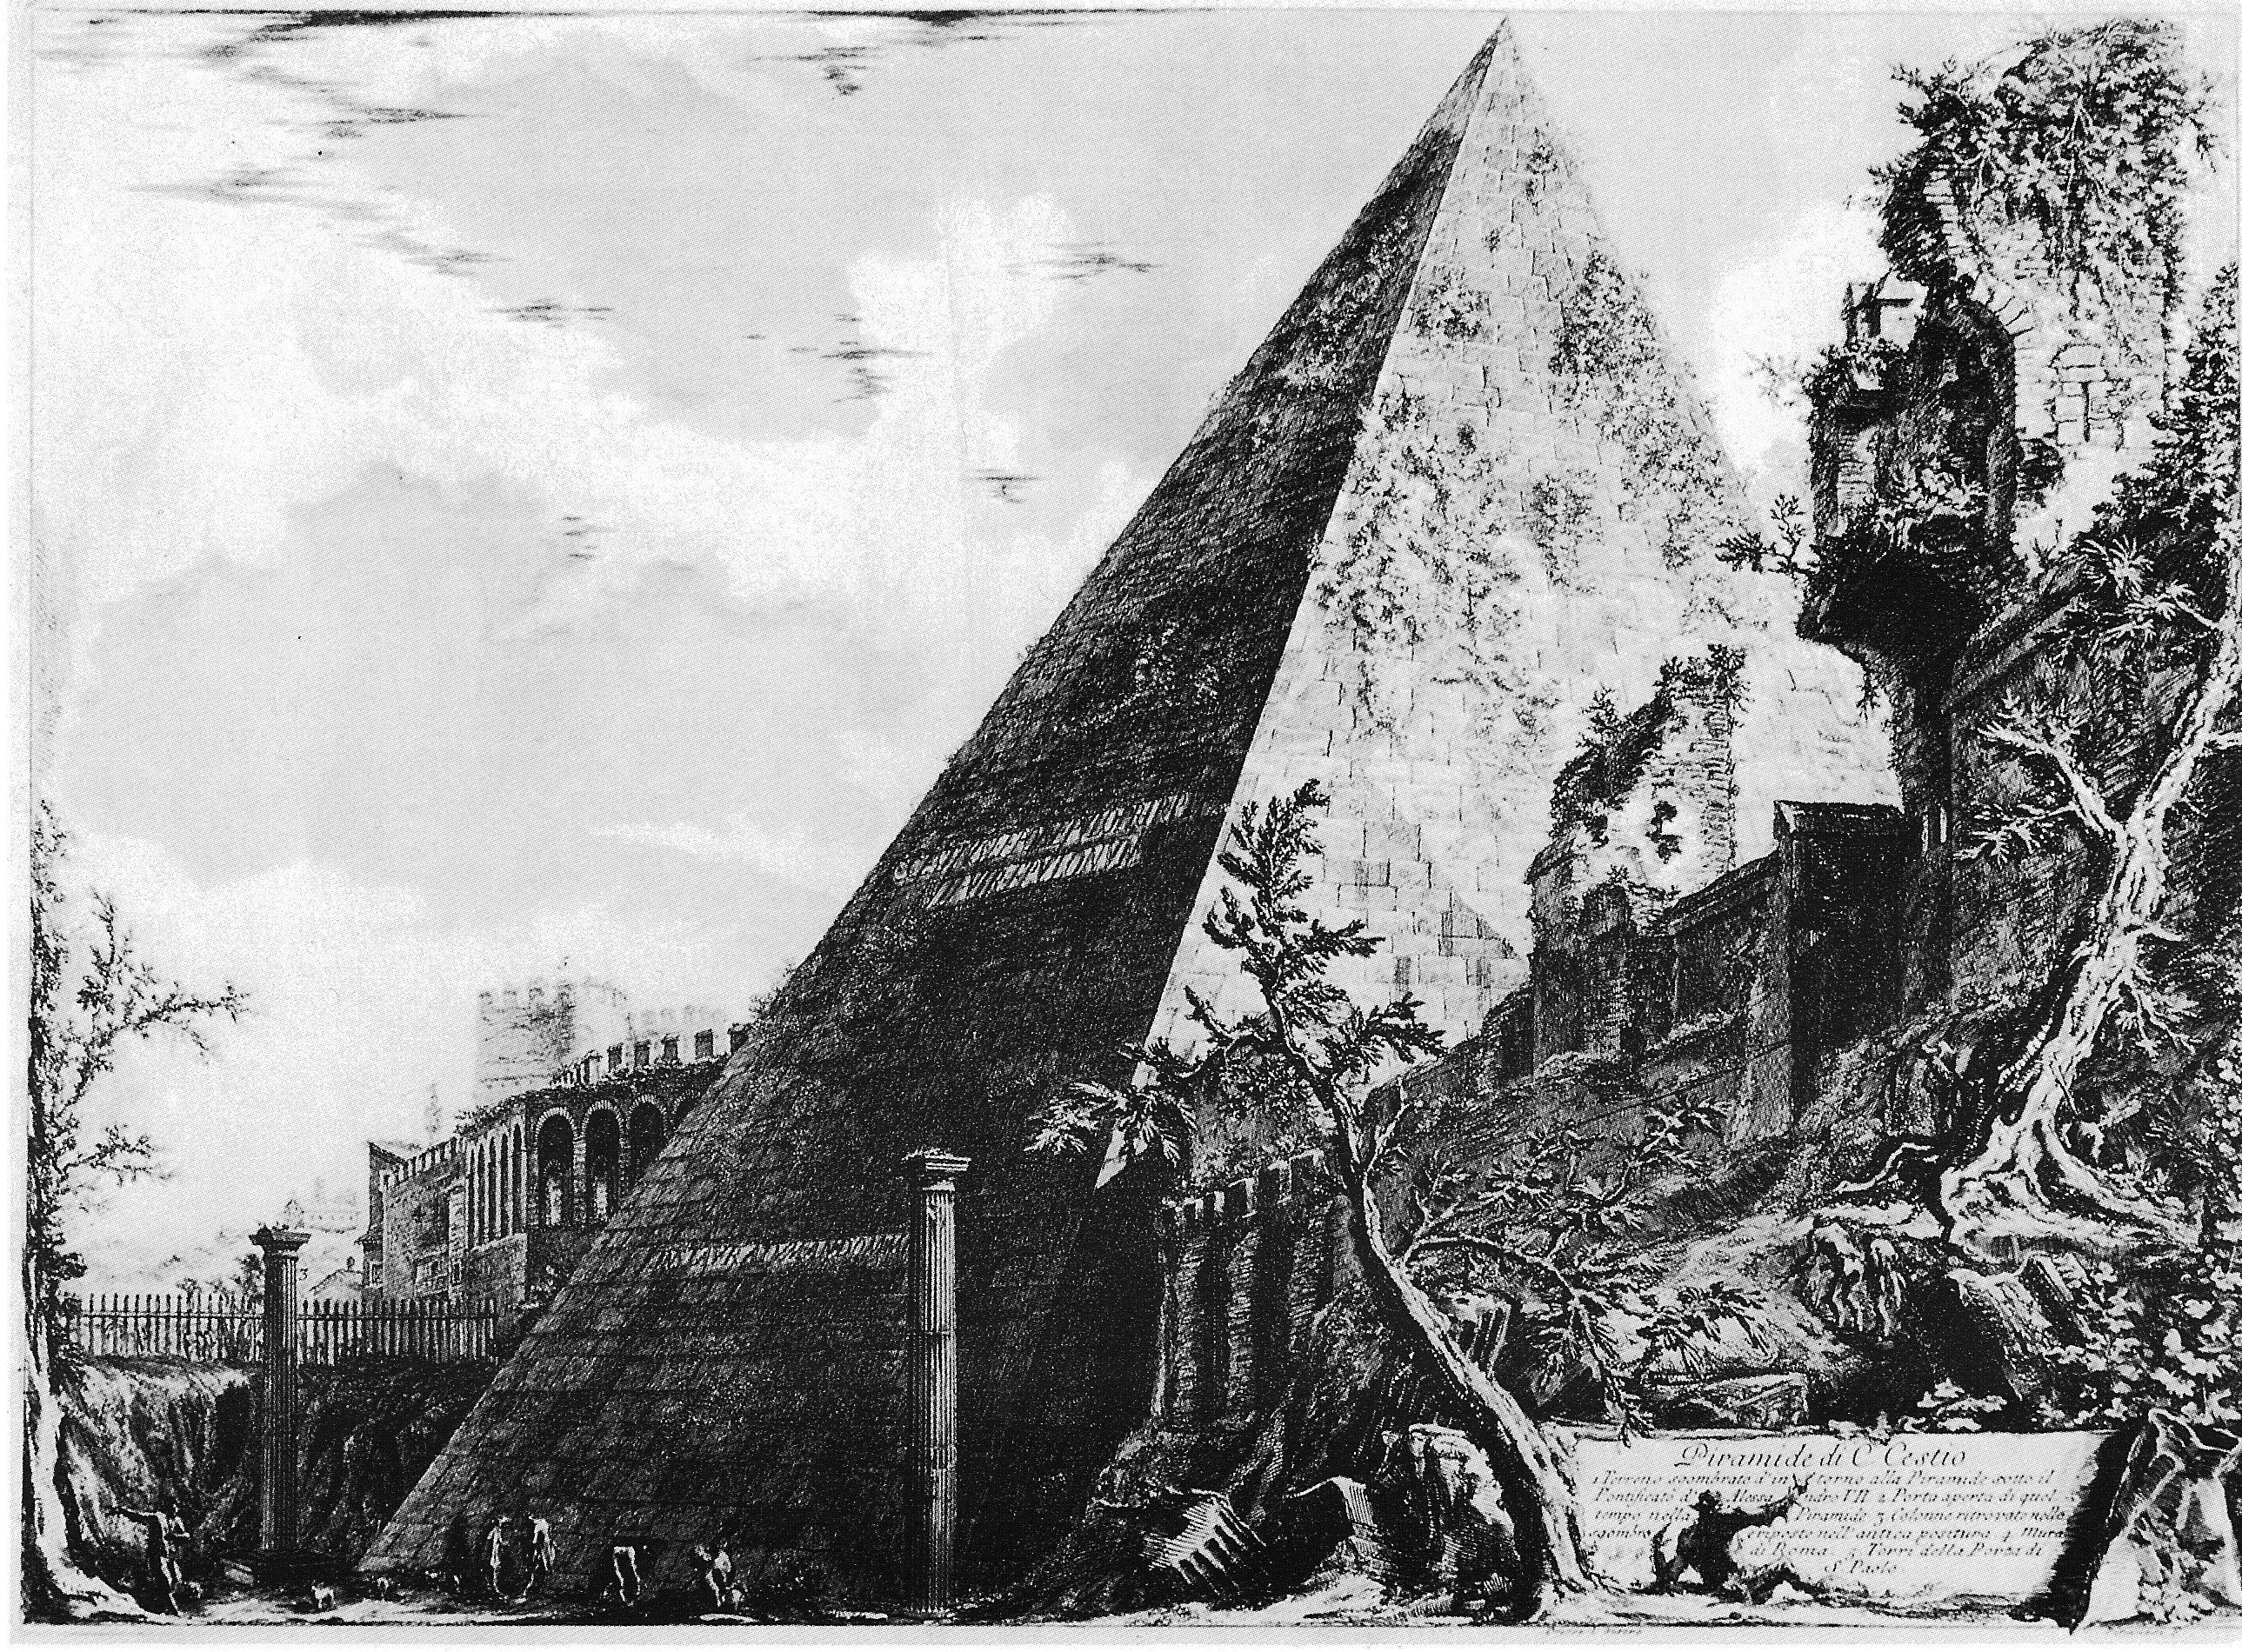 PiranesiPyramid.jpg